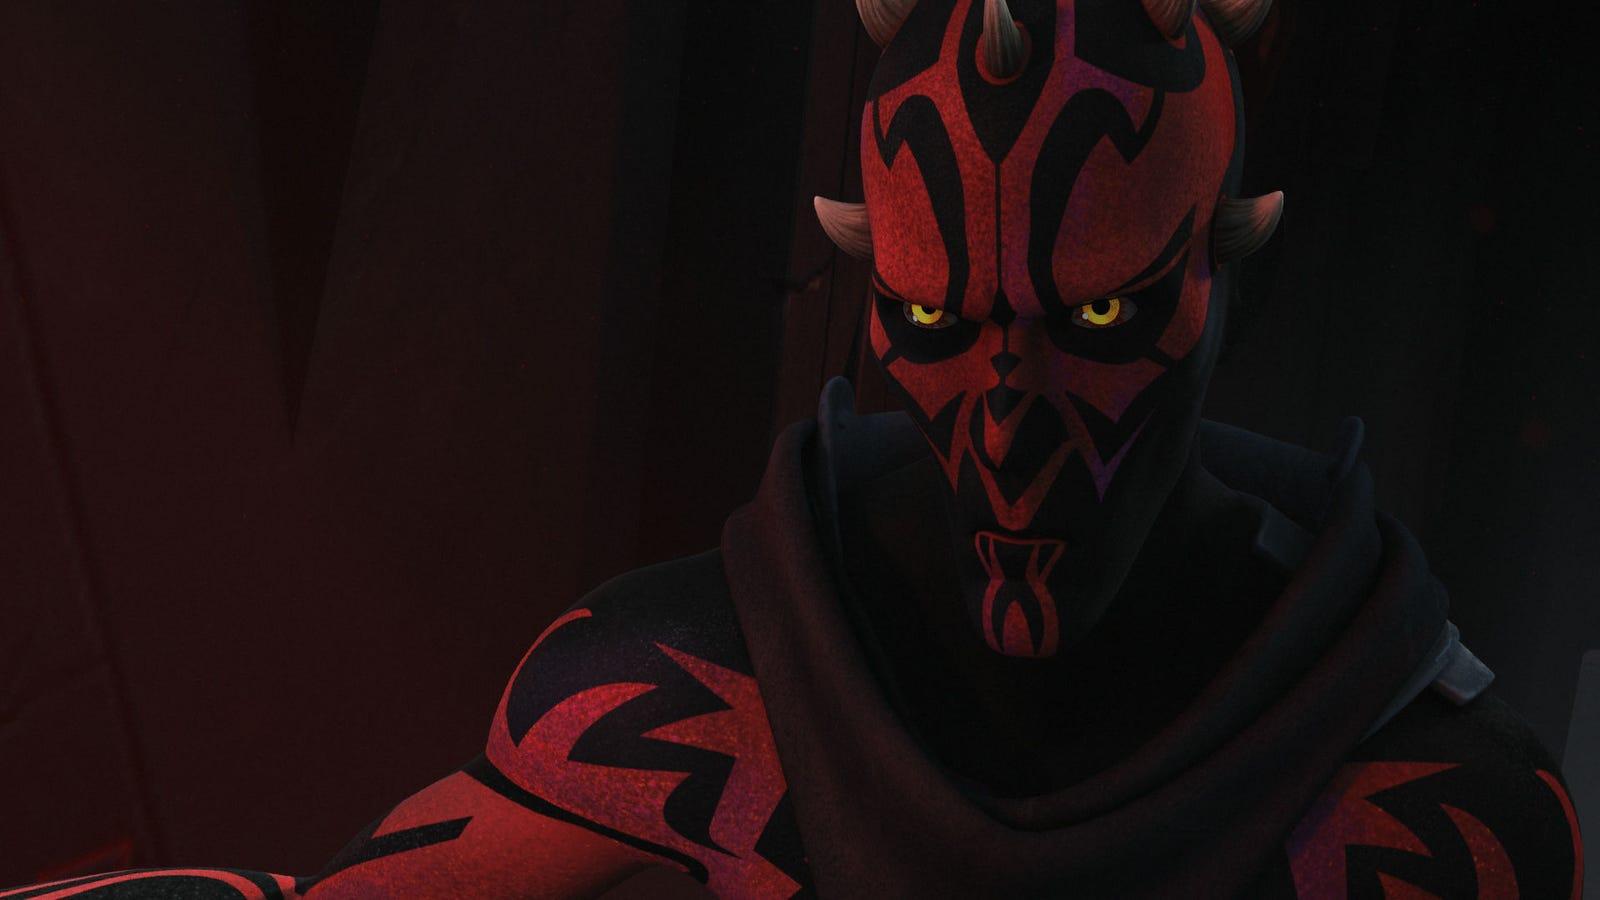 burning series star wars rebels